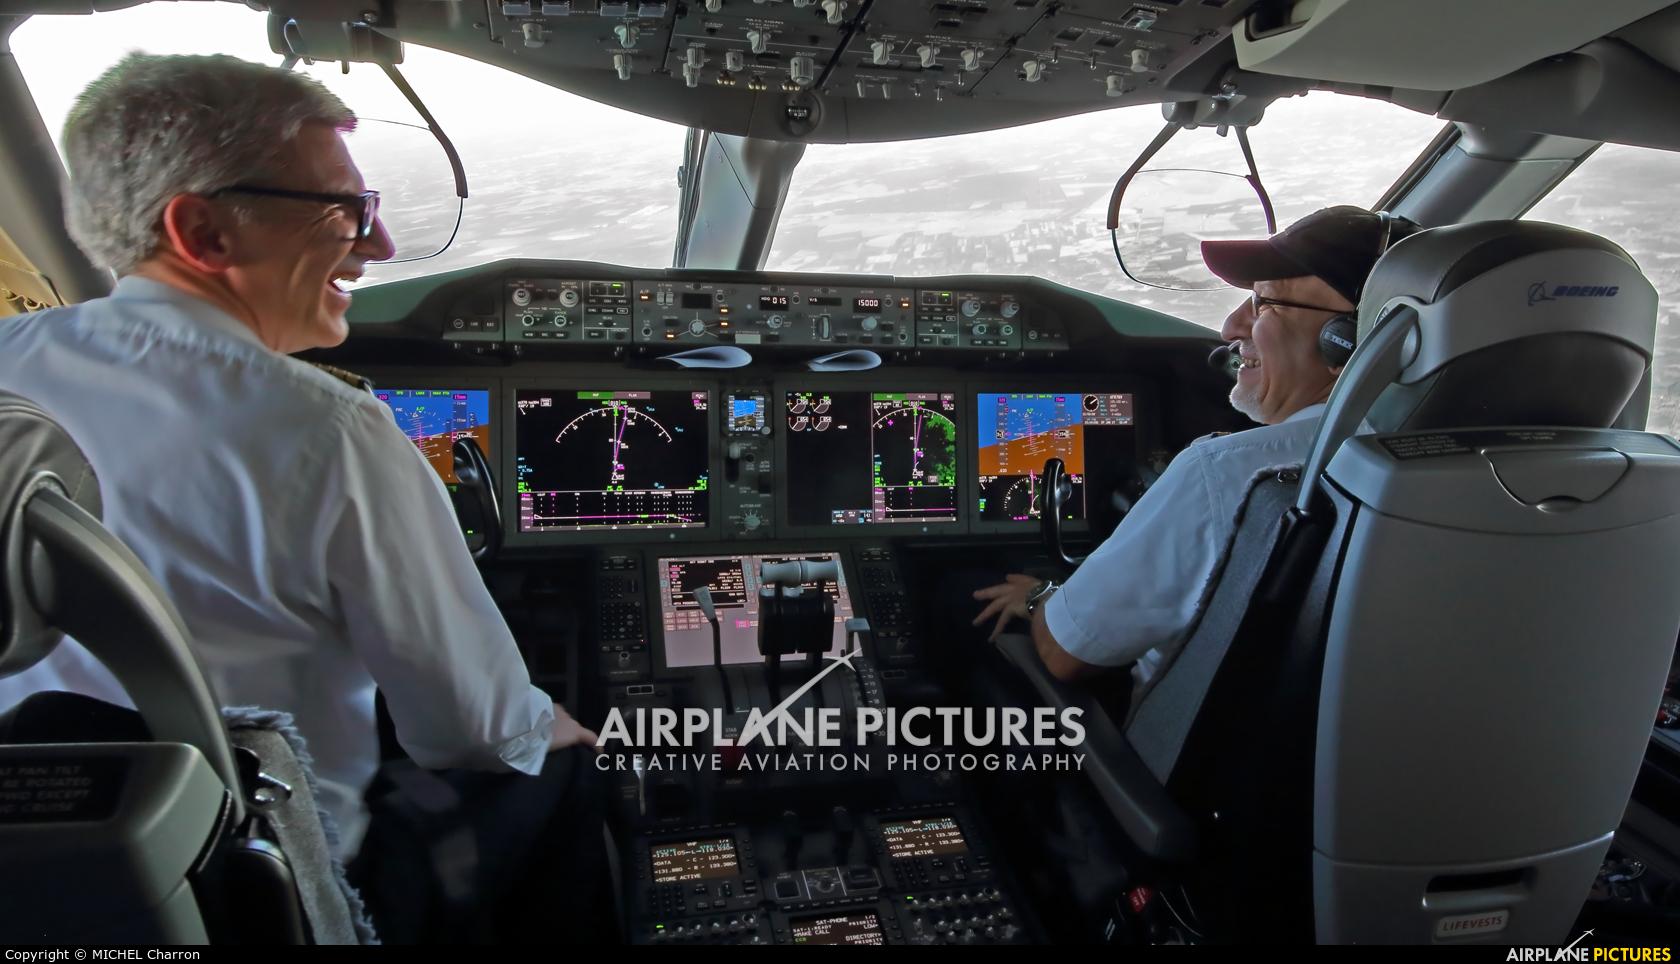 Air France F-HBRA aircraft at In Flight - France